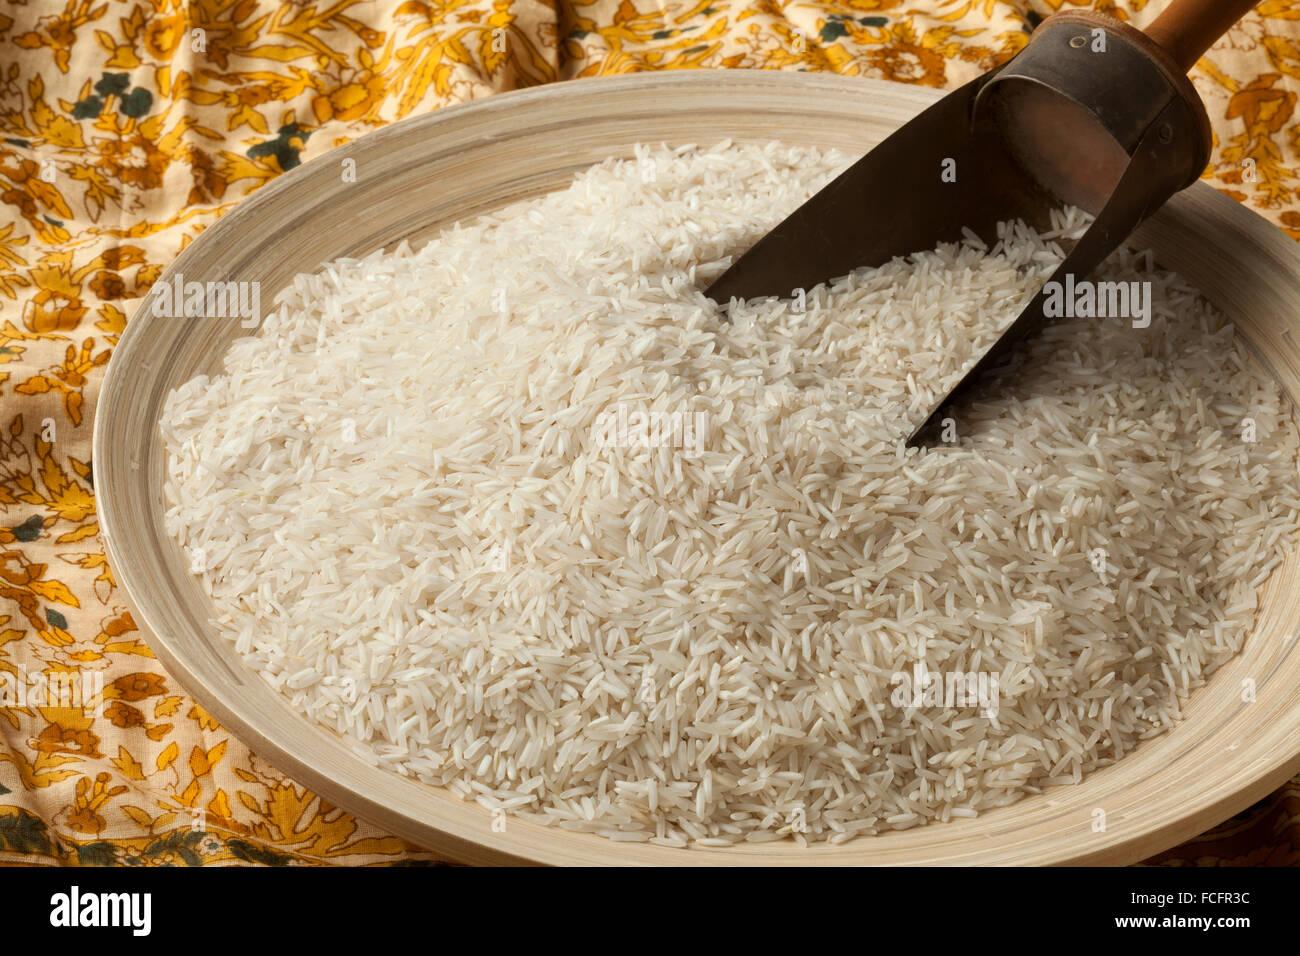 Bowl and shovel with raw Basmati rice - Stock Image